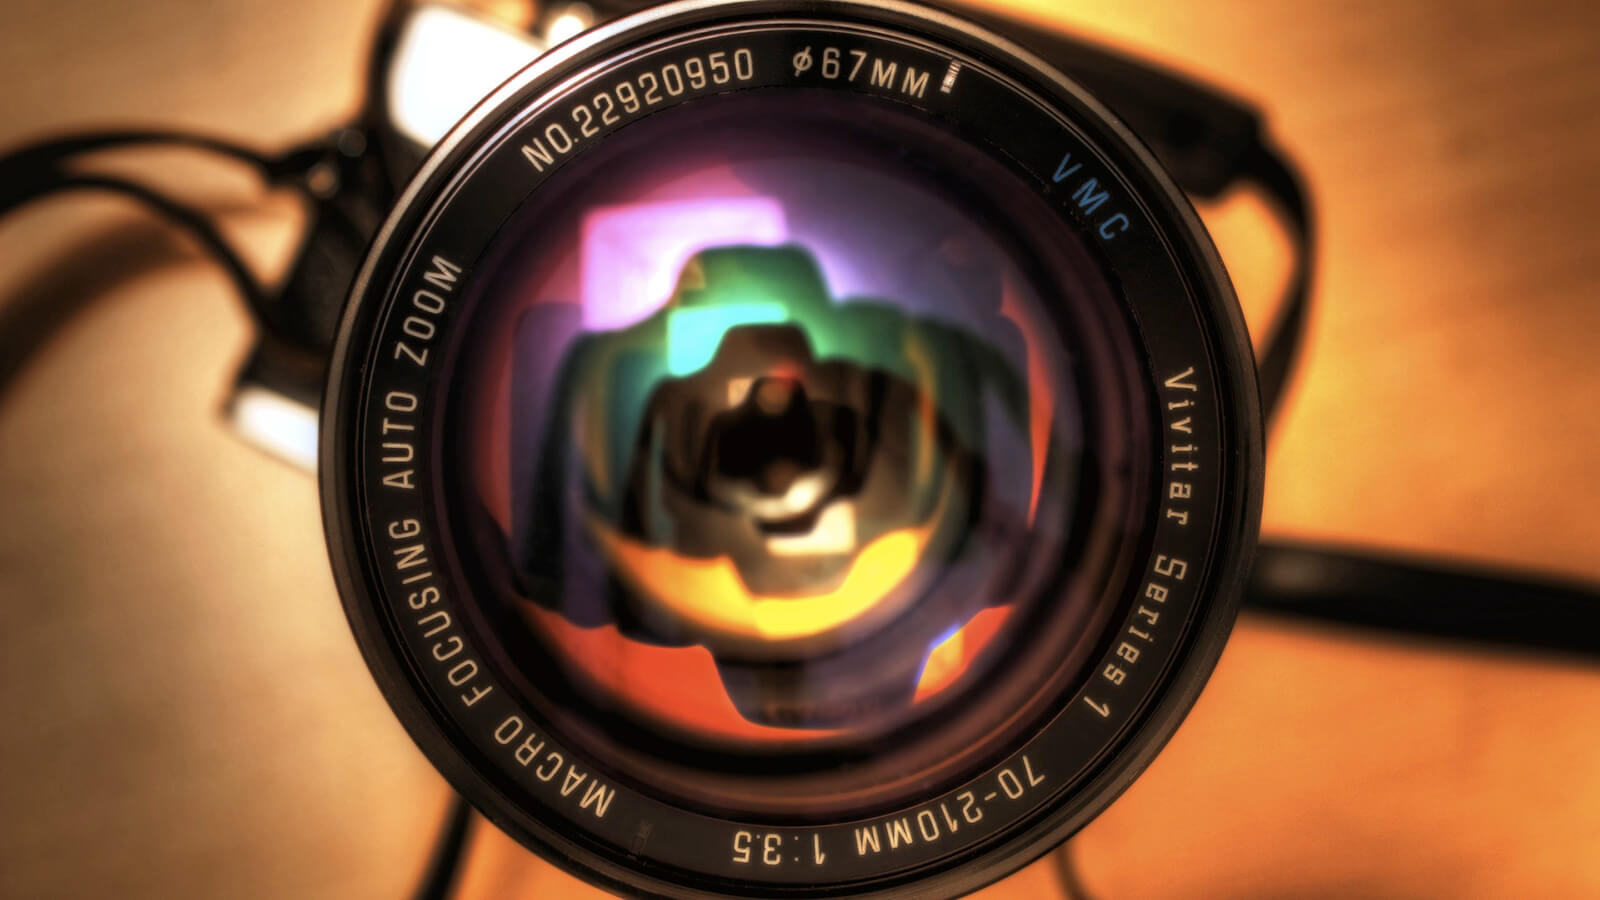 camera-lens-close-up-photography-hd-wallpaper-1920x1080-9574